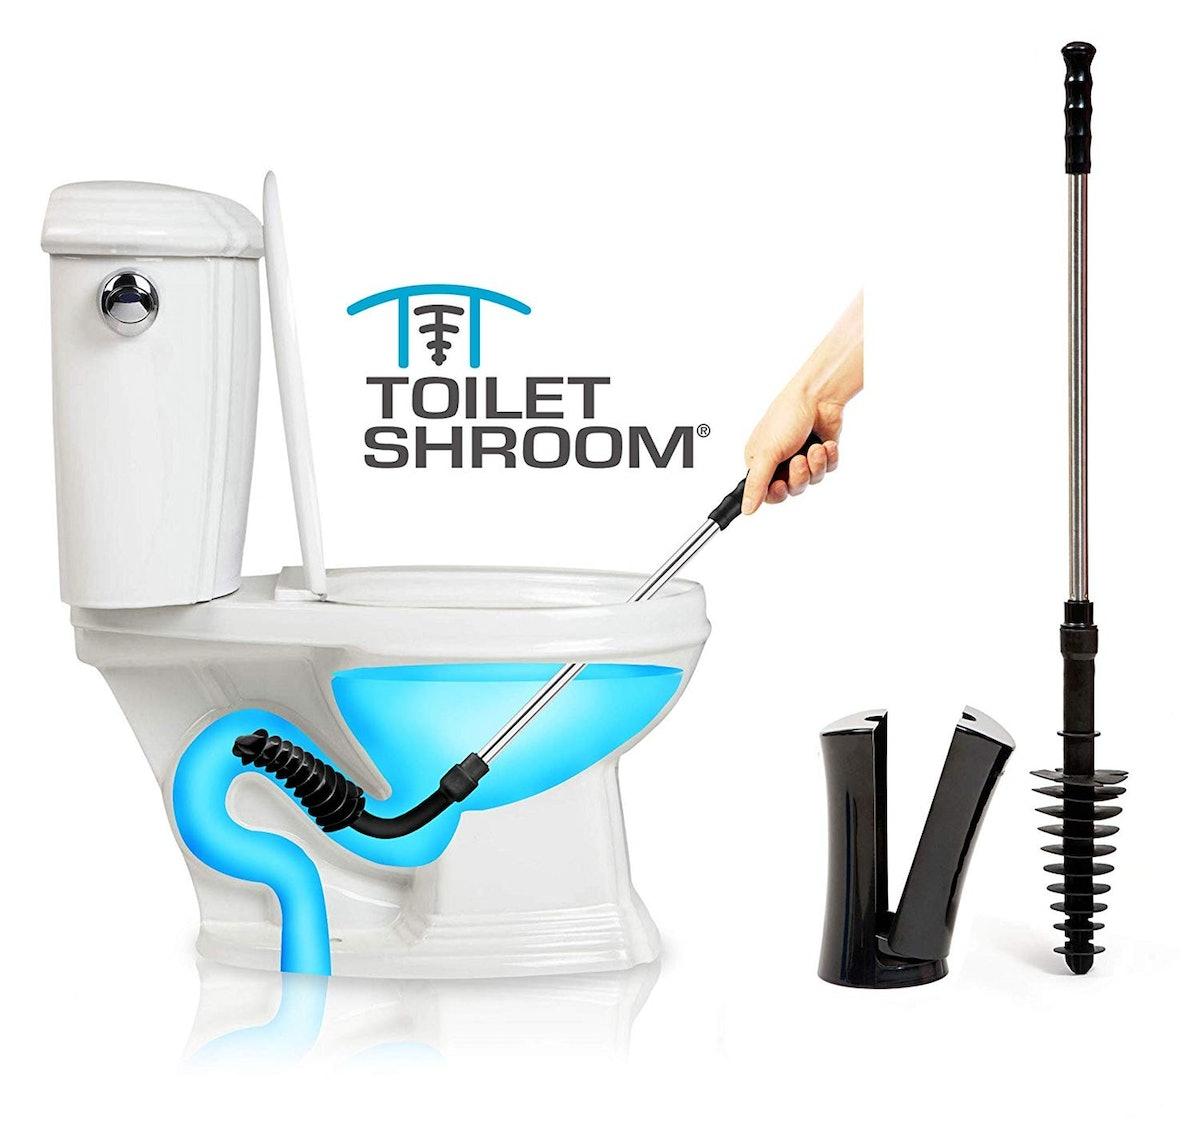 ToiletShroom Revolutionary Plunger